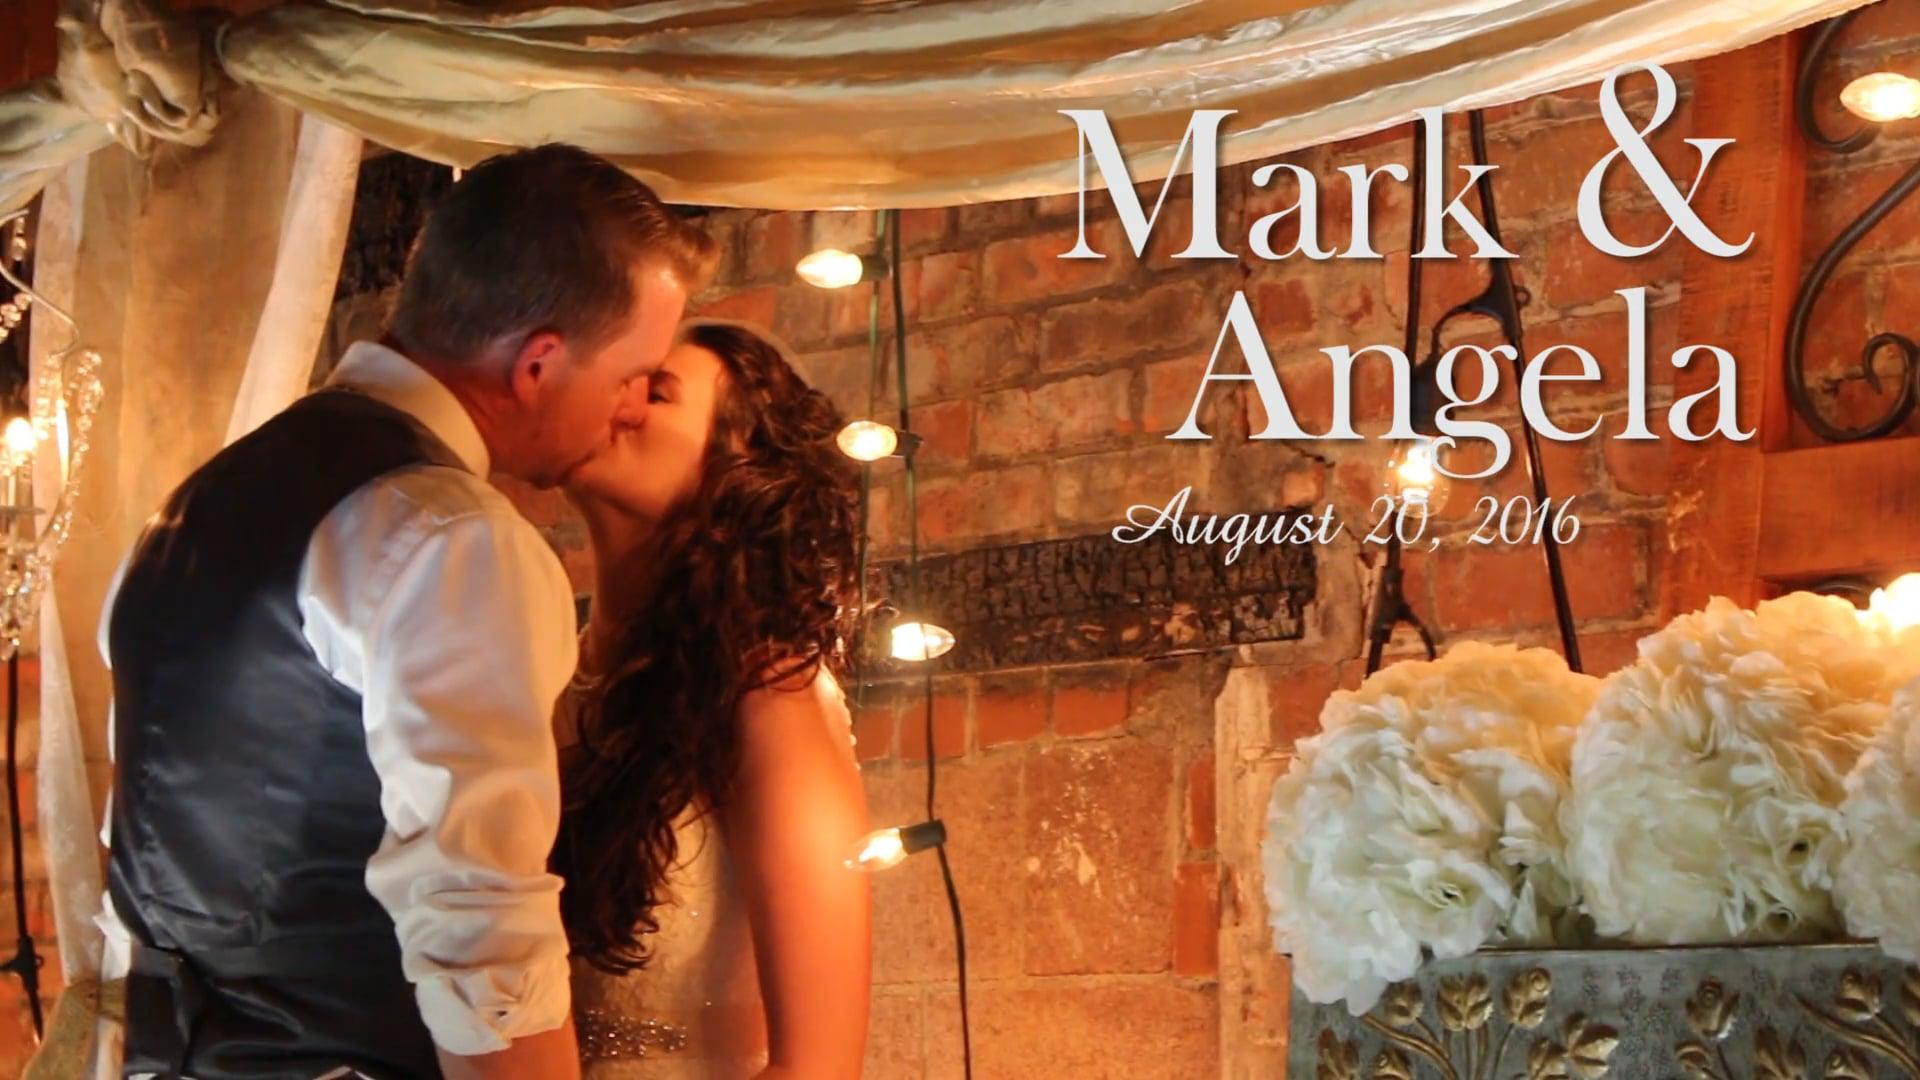 Mark & Angela - August 20, 2016